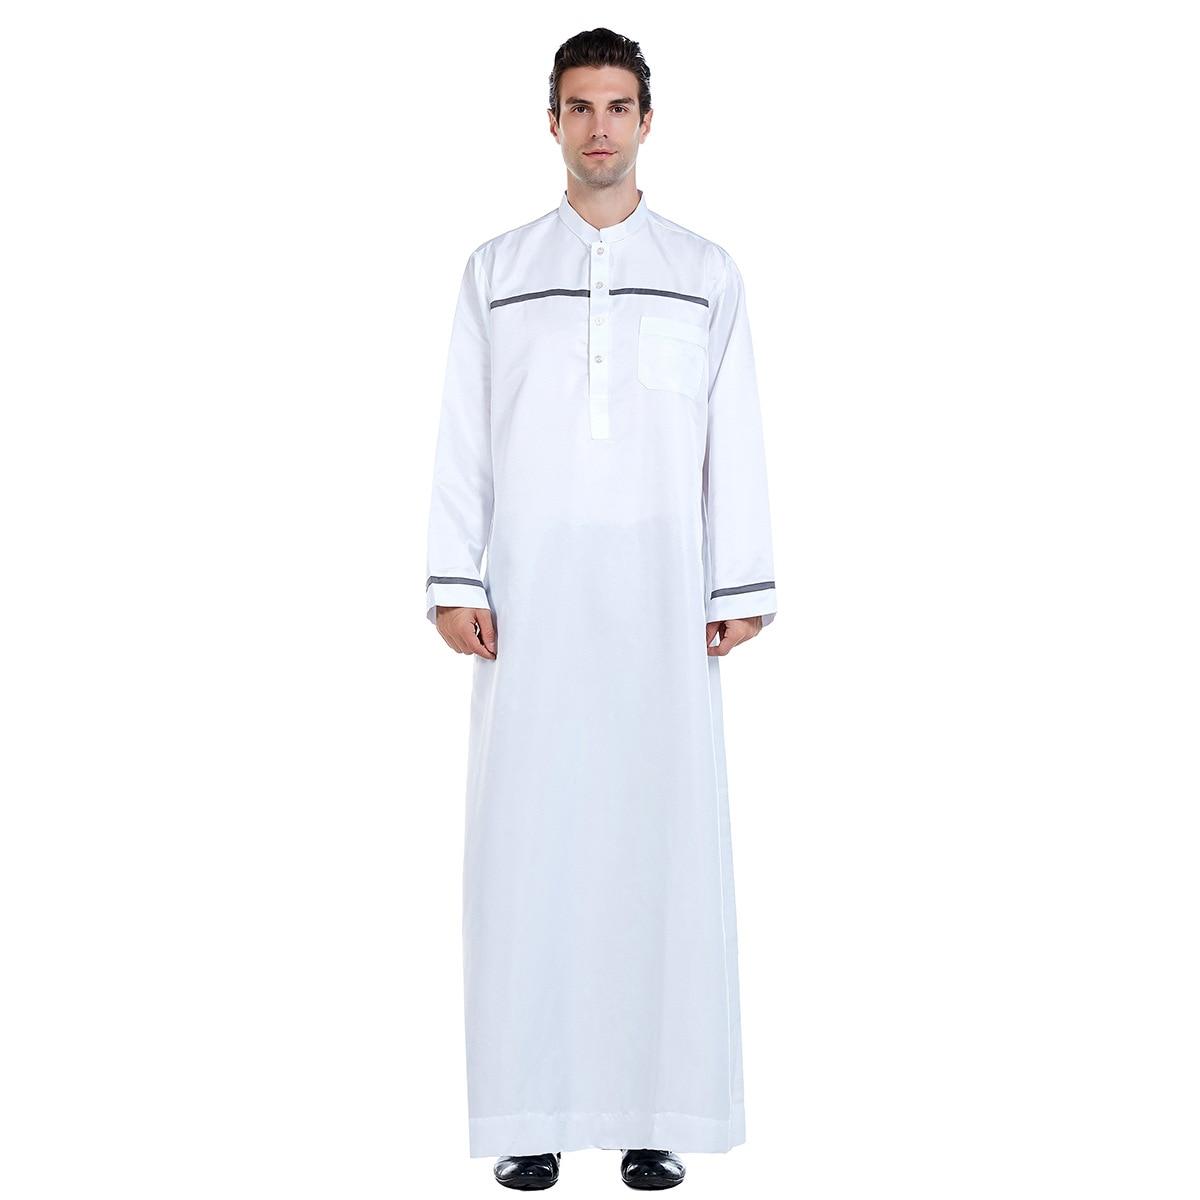 Muslim Men Arab Islamic Kaftan Patchwork Stand Collar Abaya Long Sleeve Fashion Saudi Arabia Men Jubba Thobe Plus Size